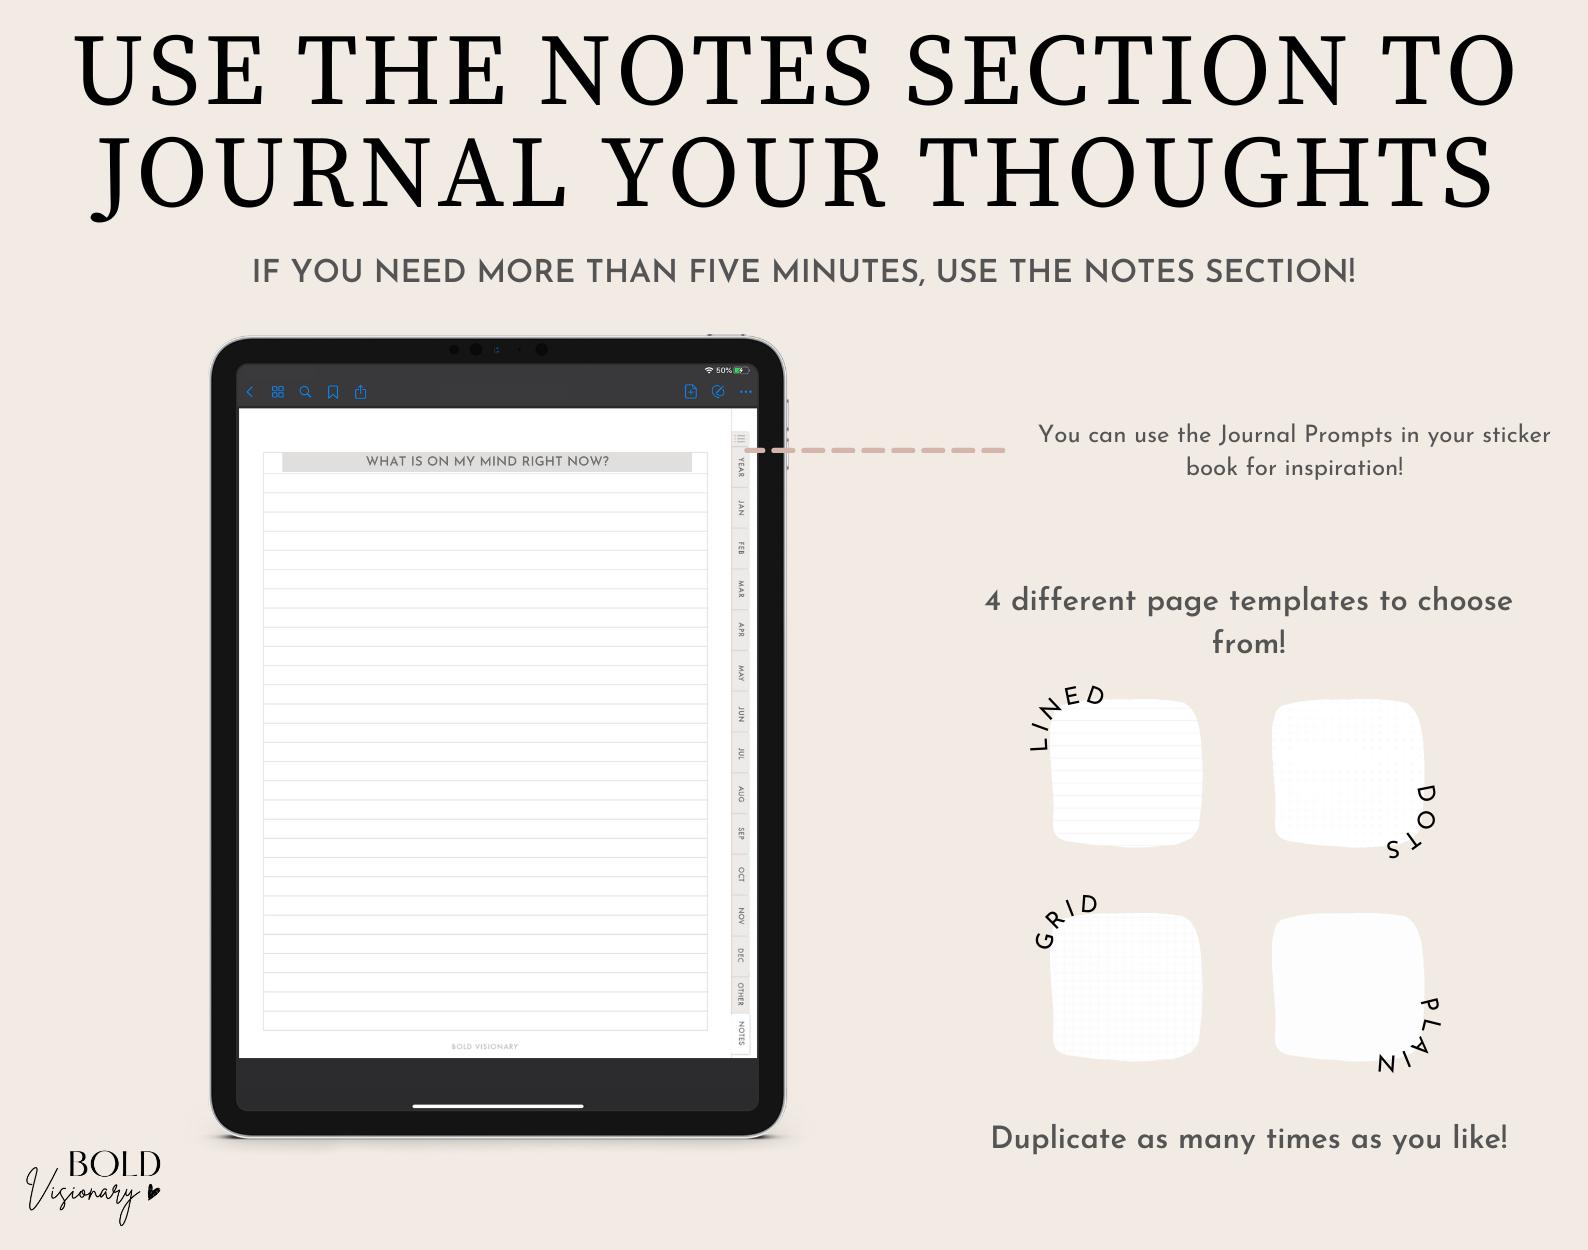 7Notes-Bold-Visionary-Digital-Gratitude-Journal